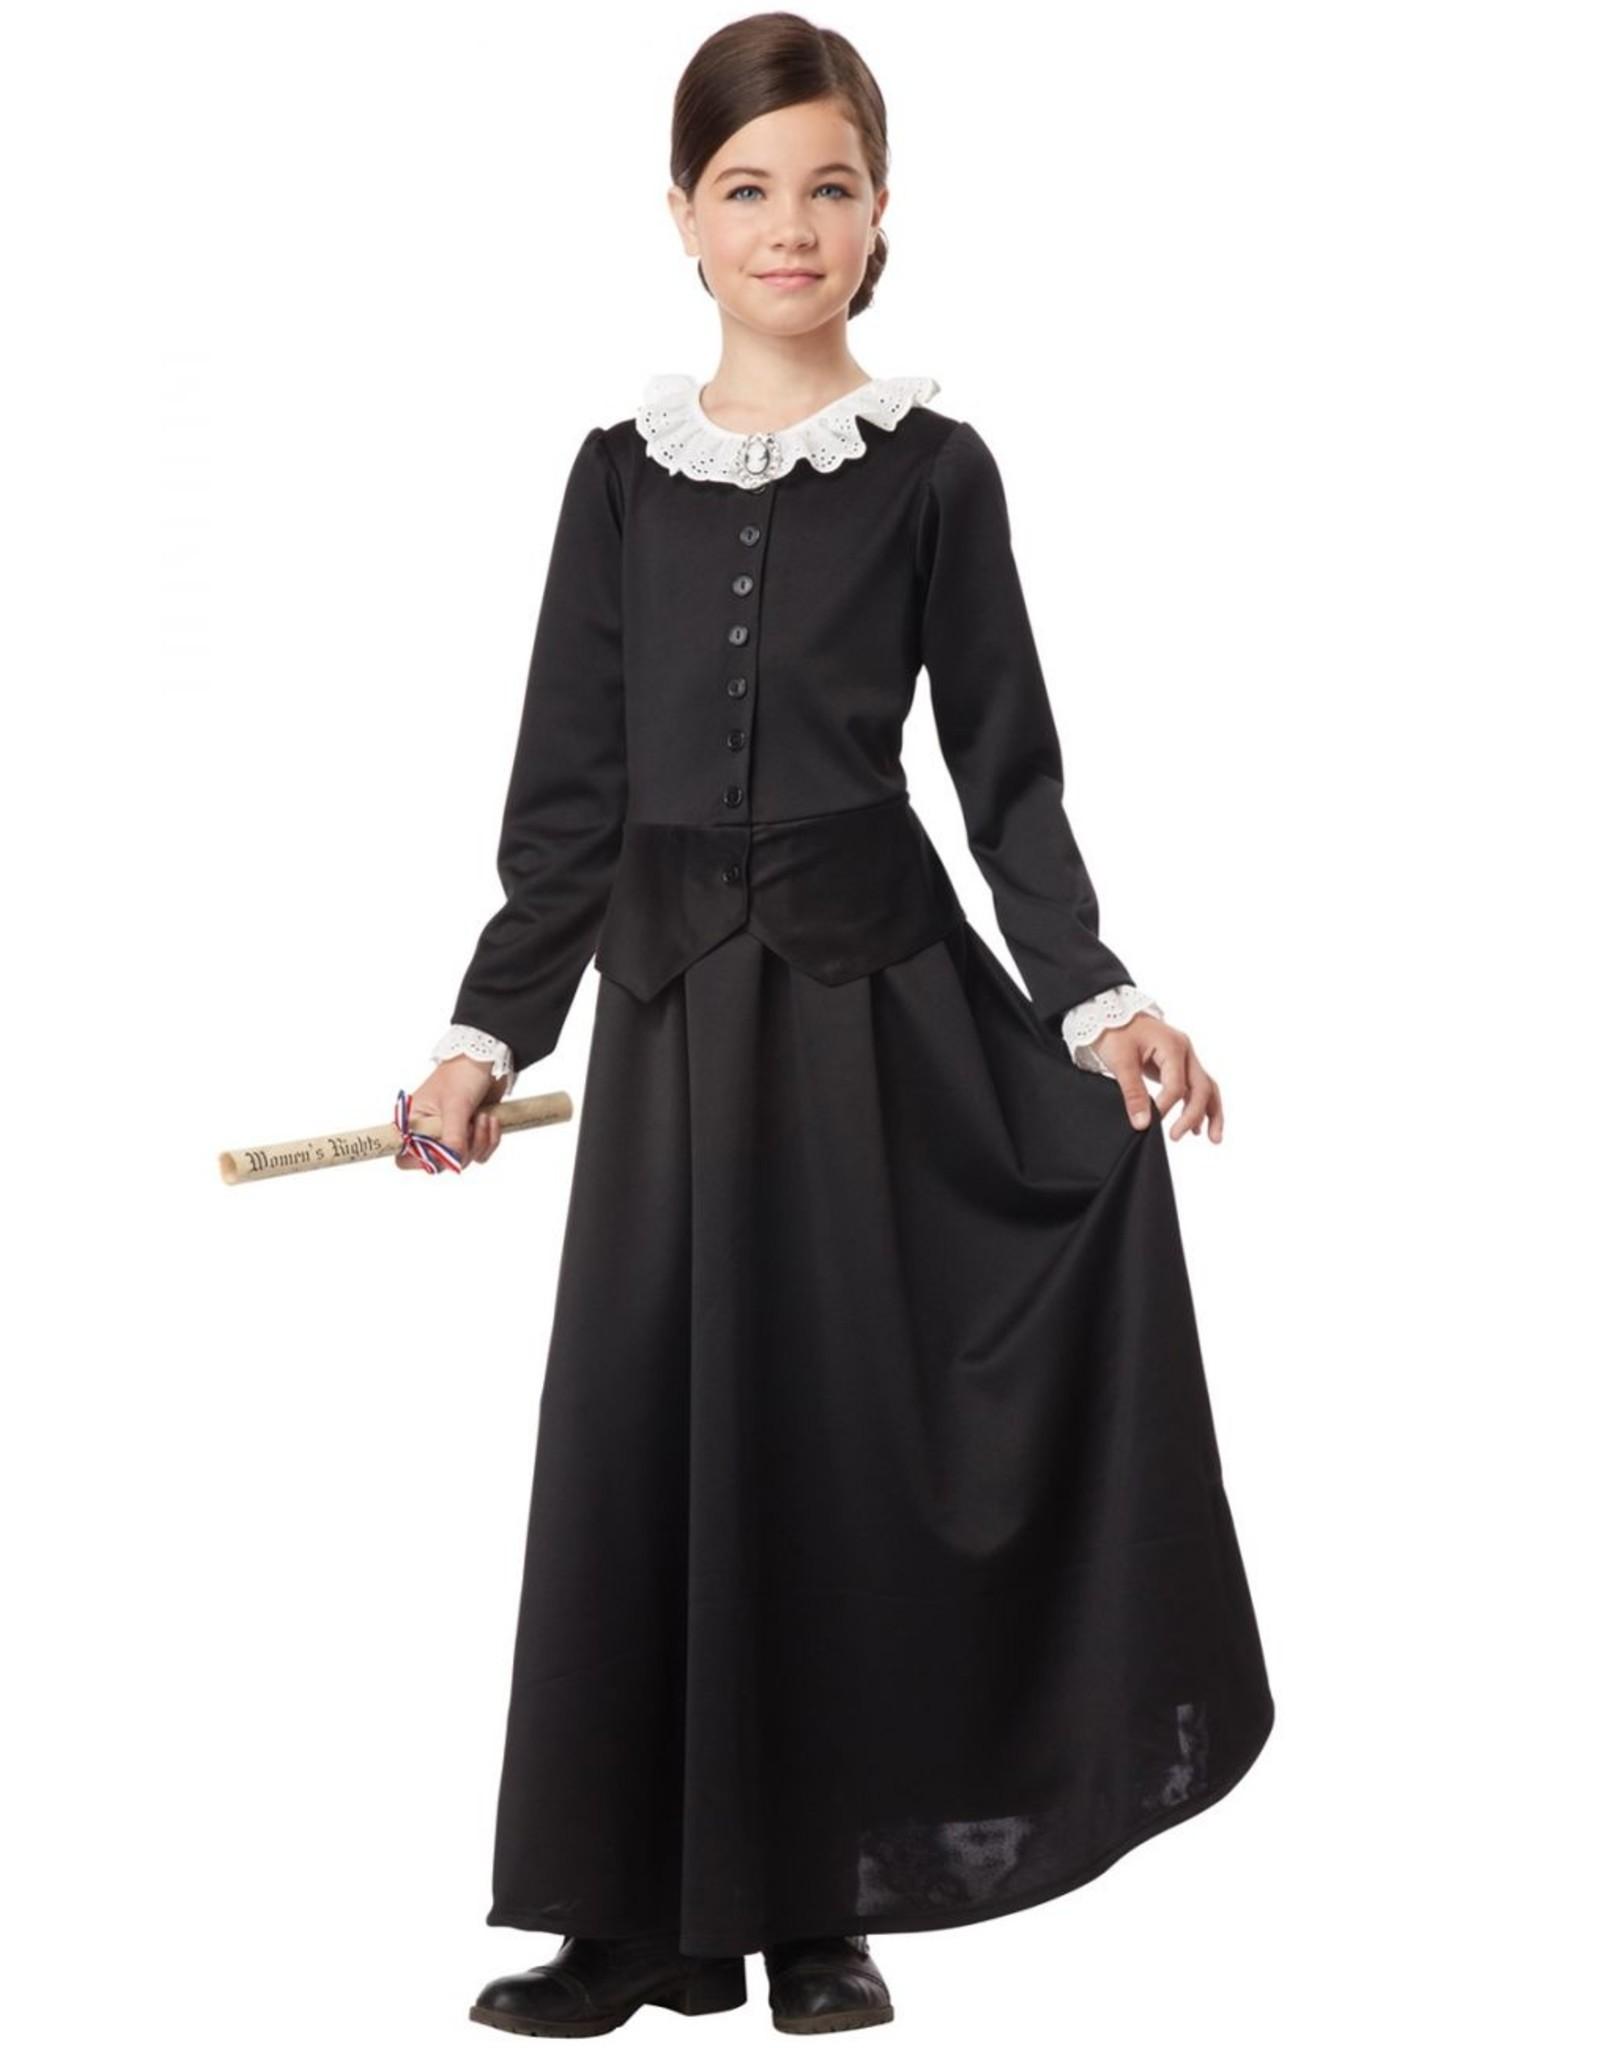 California Costume Susan B. Anthony